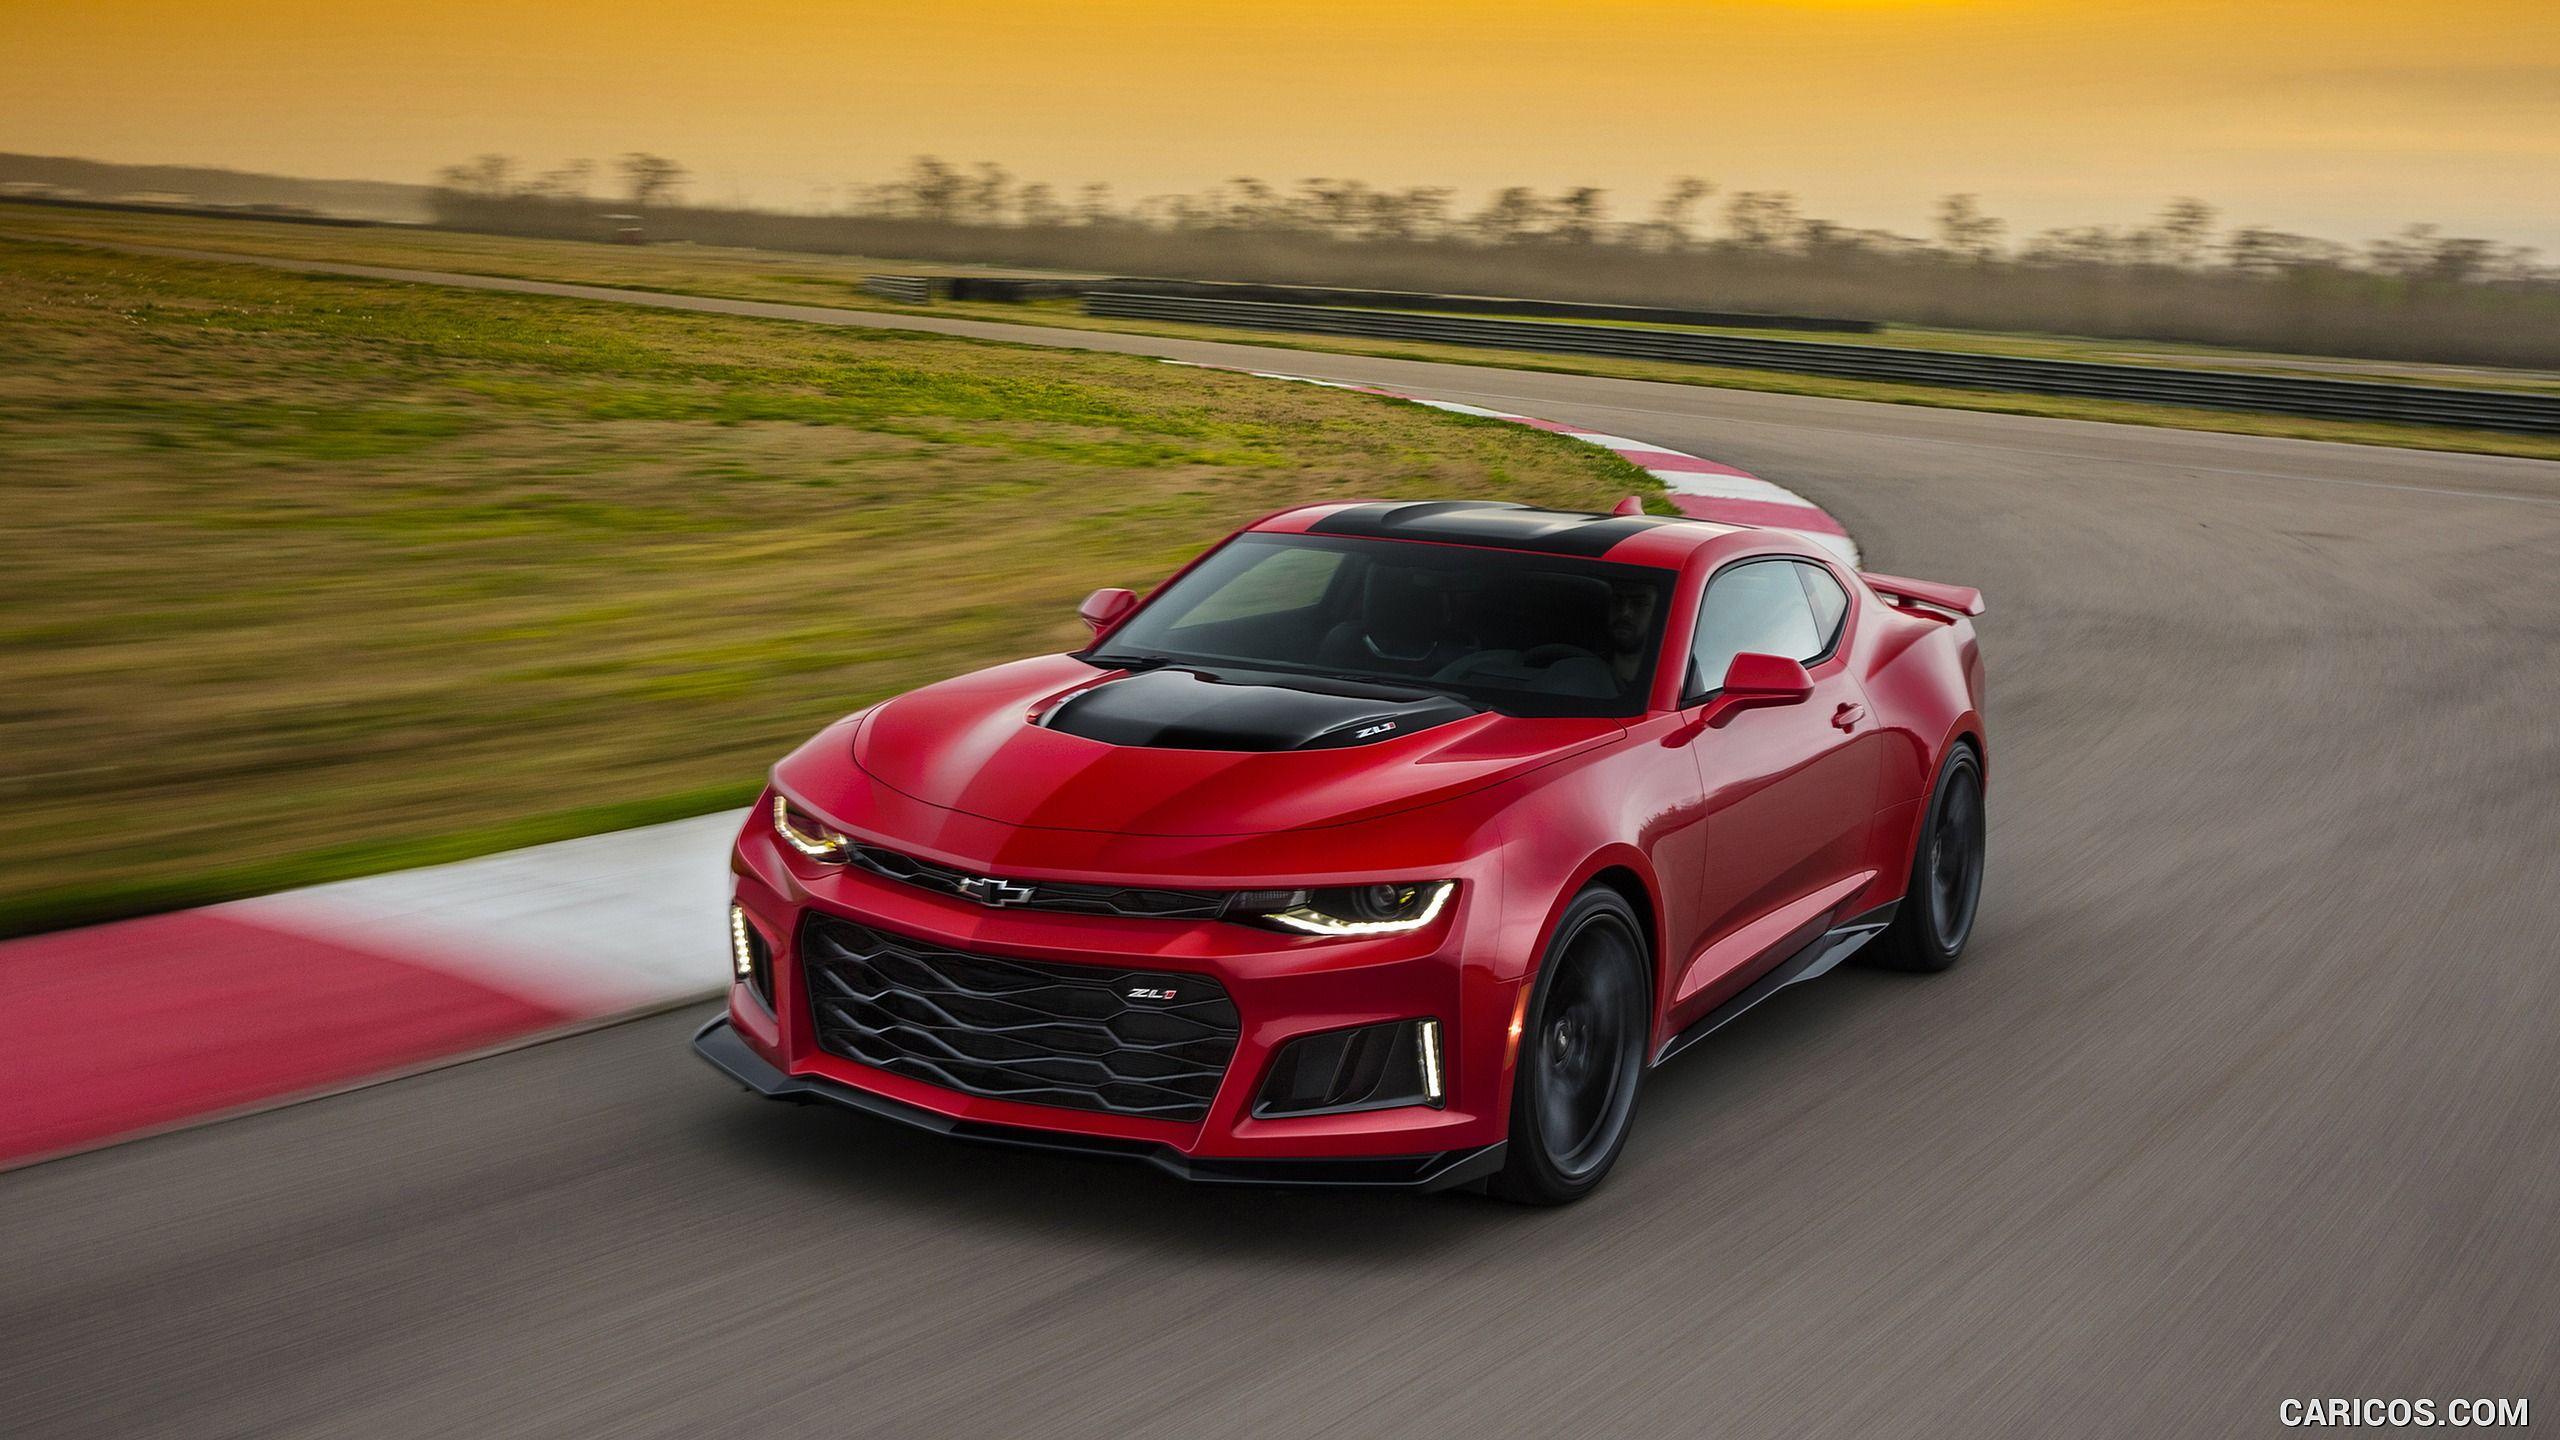 2014 zl1 camaro recaro seats html 2017 2018 cars reviews - 2017 Chevrolet Camaro Zl1 Wallpaper